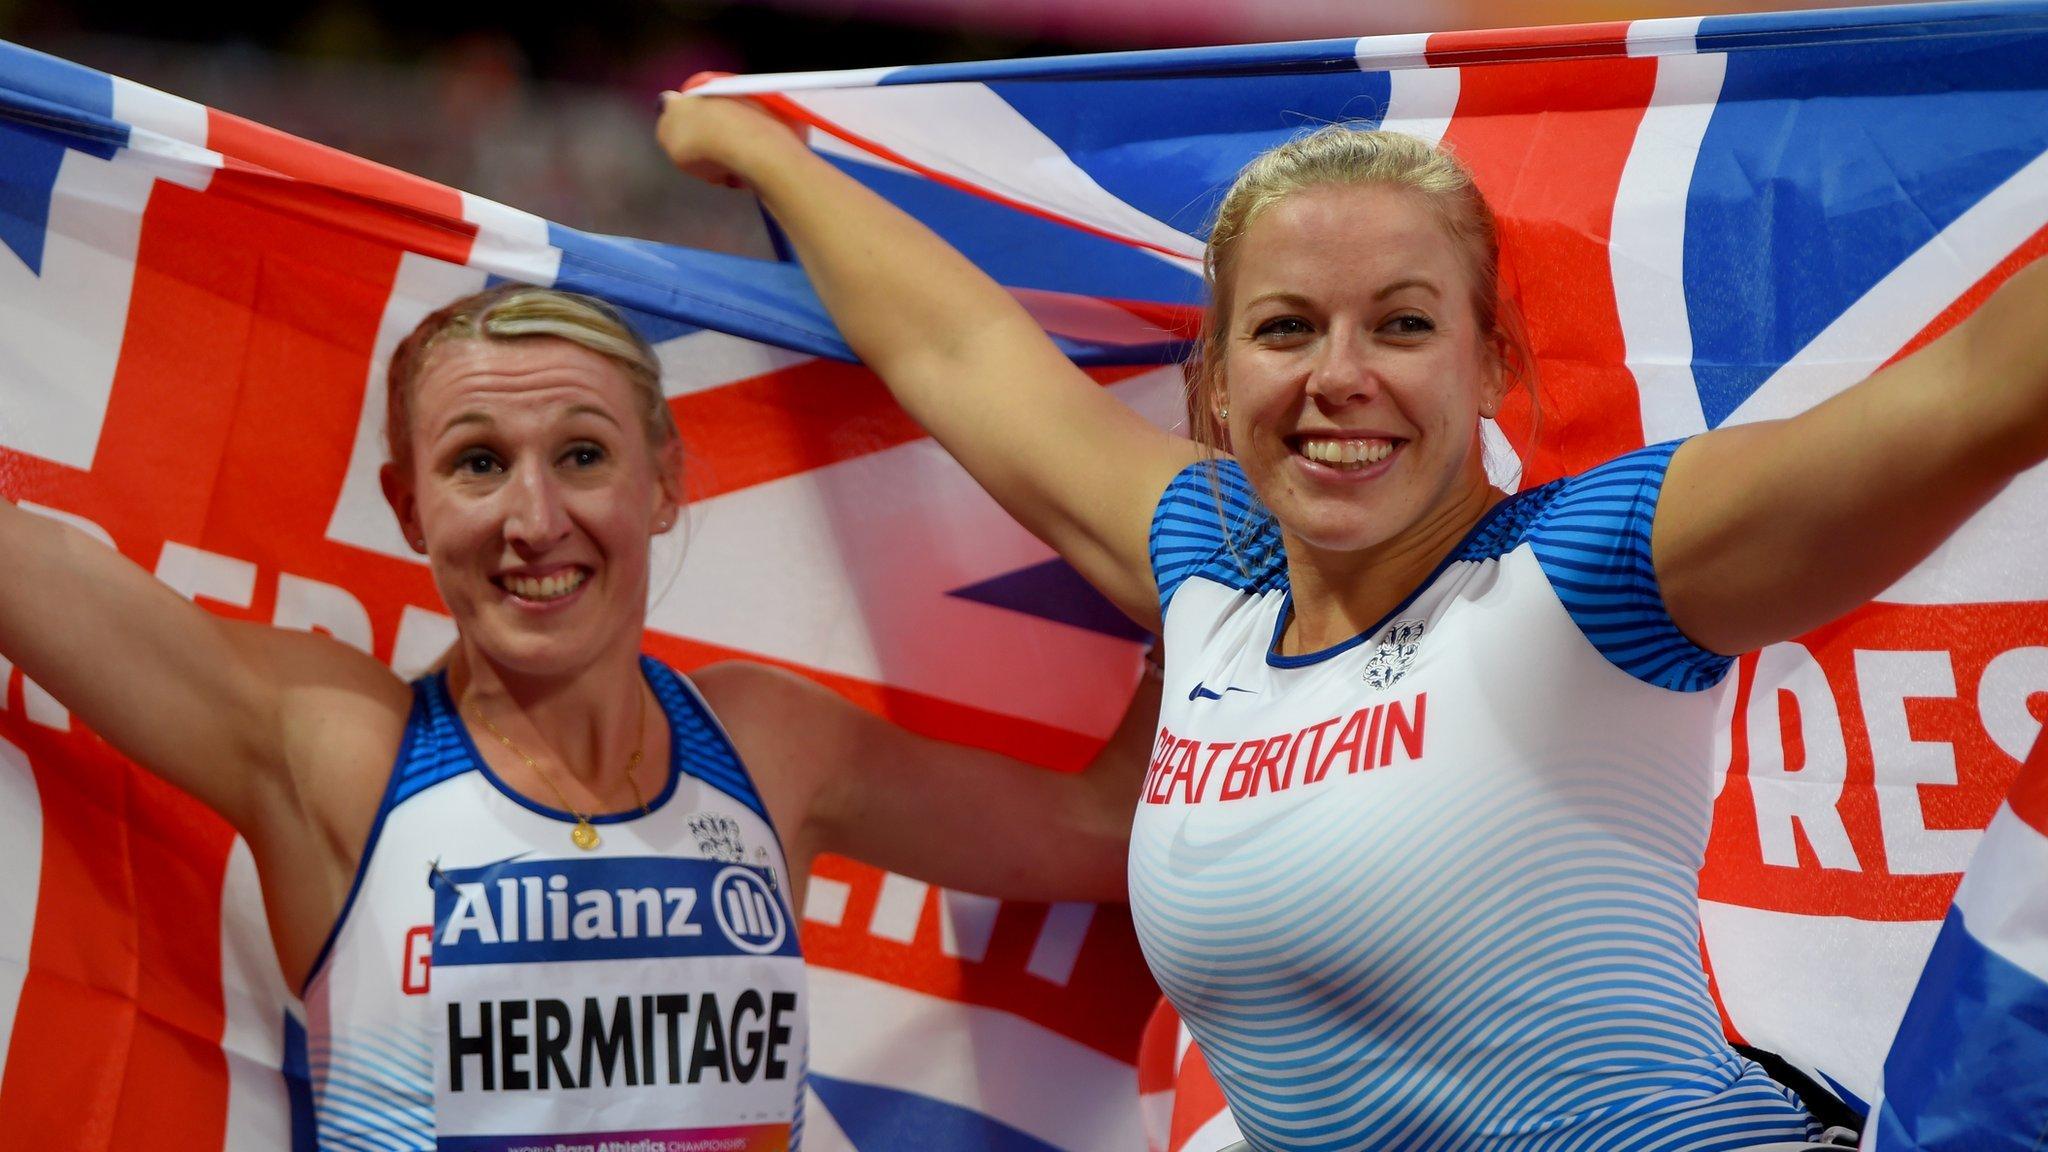 Cockroft wins third gold & Hermitage sets world record